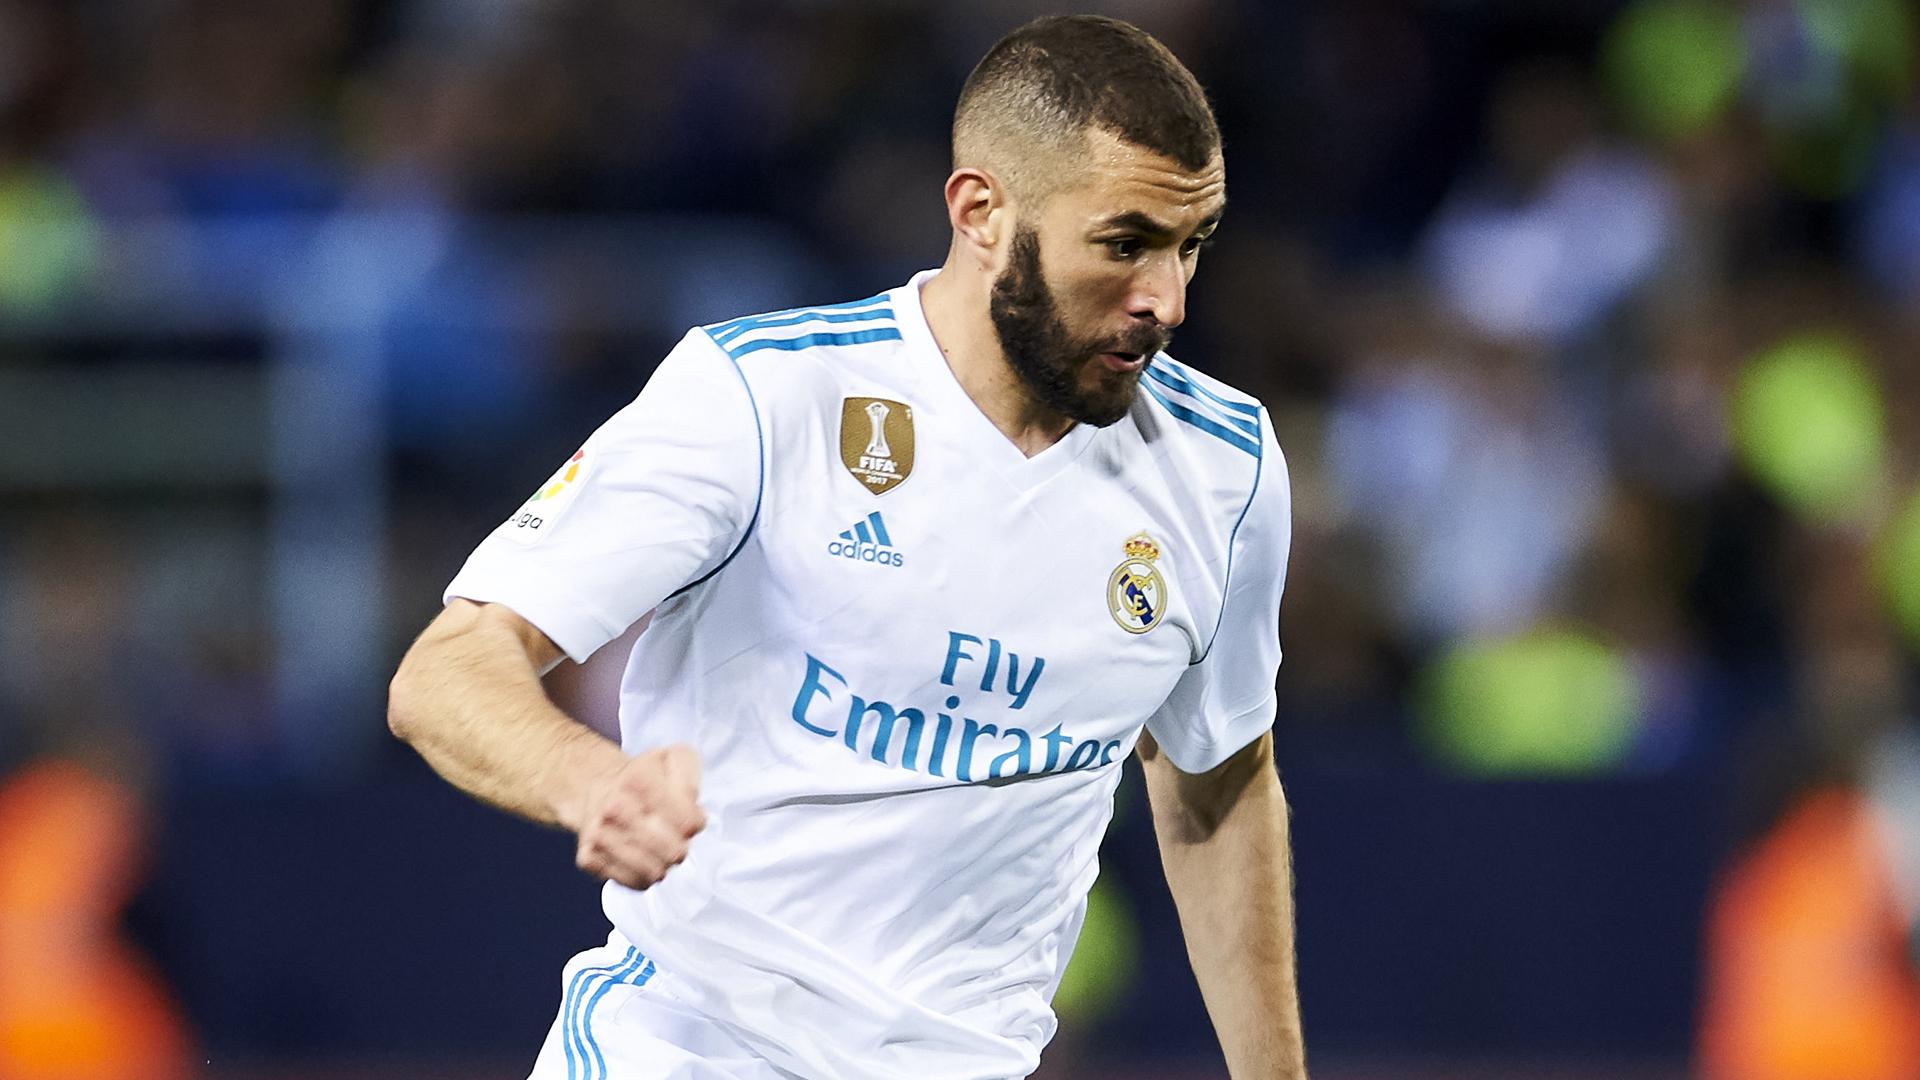 Real Madrid Zinedine Zidane Still Backing Struggling Striker Karim Benzema Goal Com